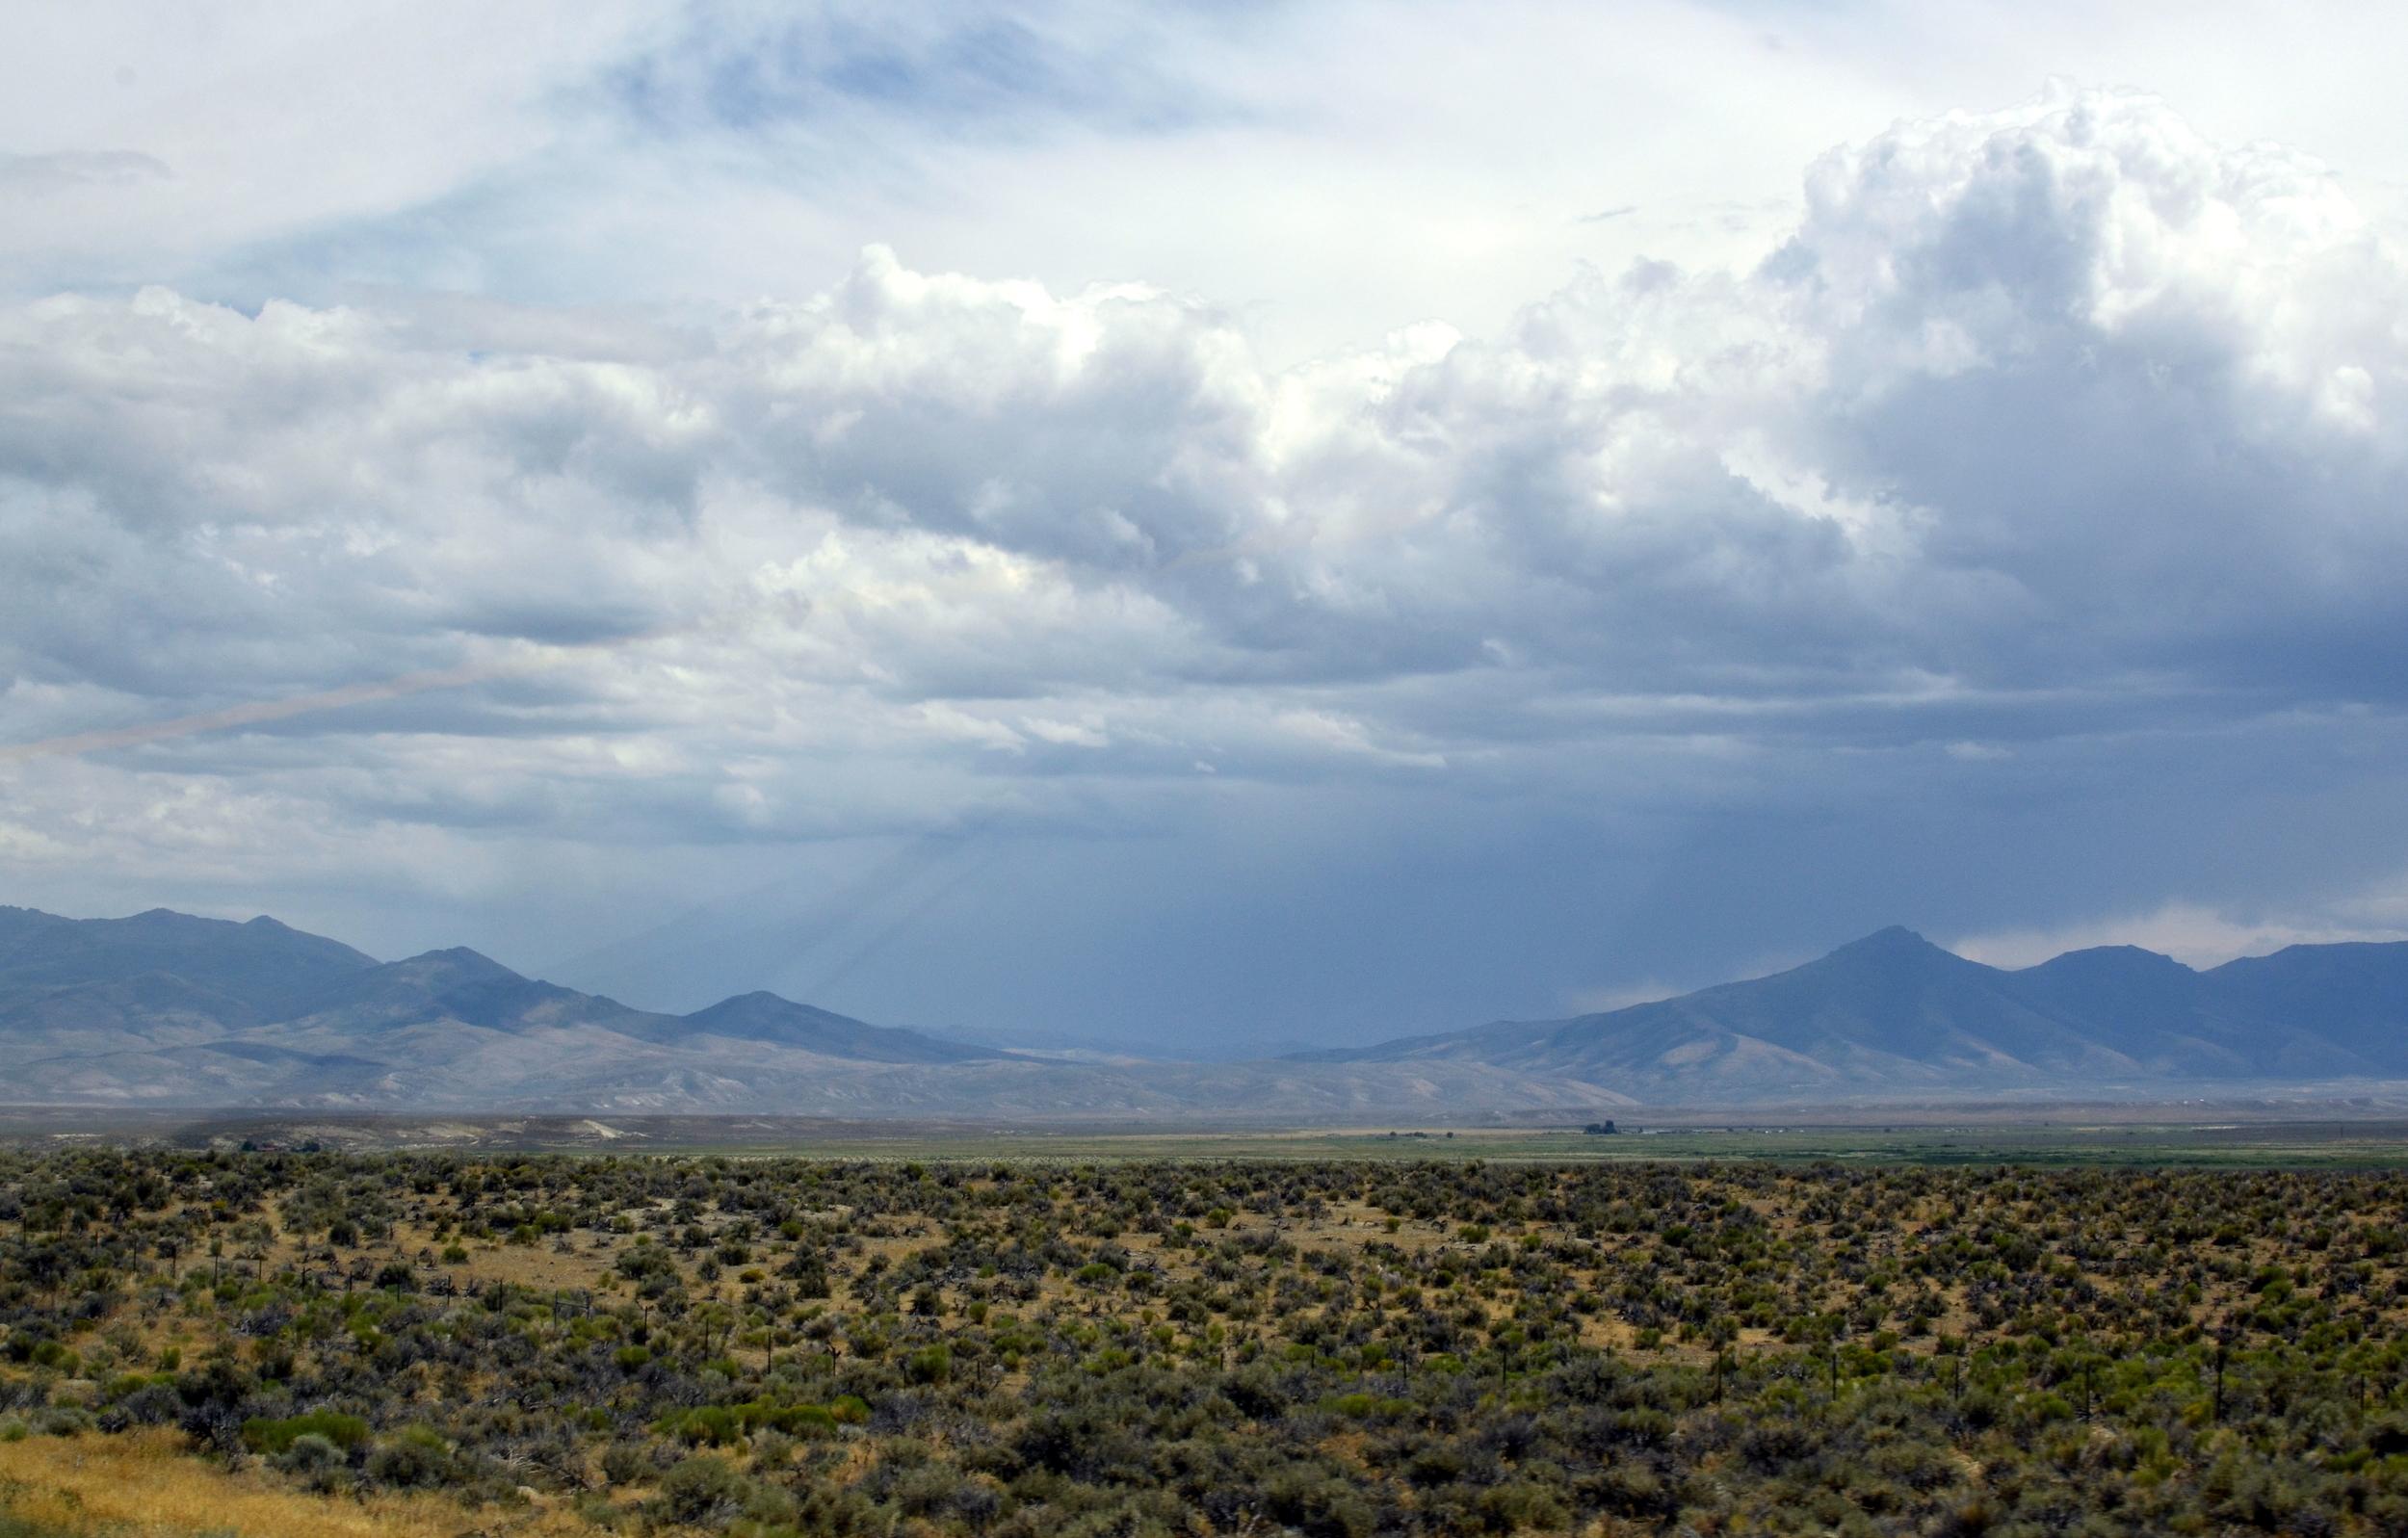 016 Utah Clouds and Mountains.jpg